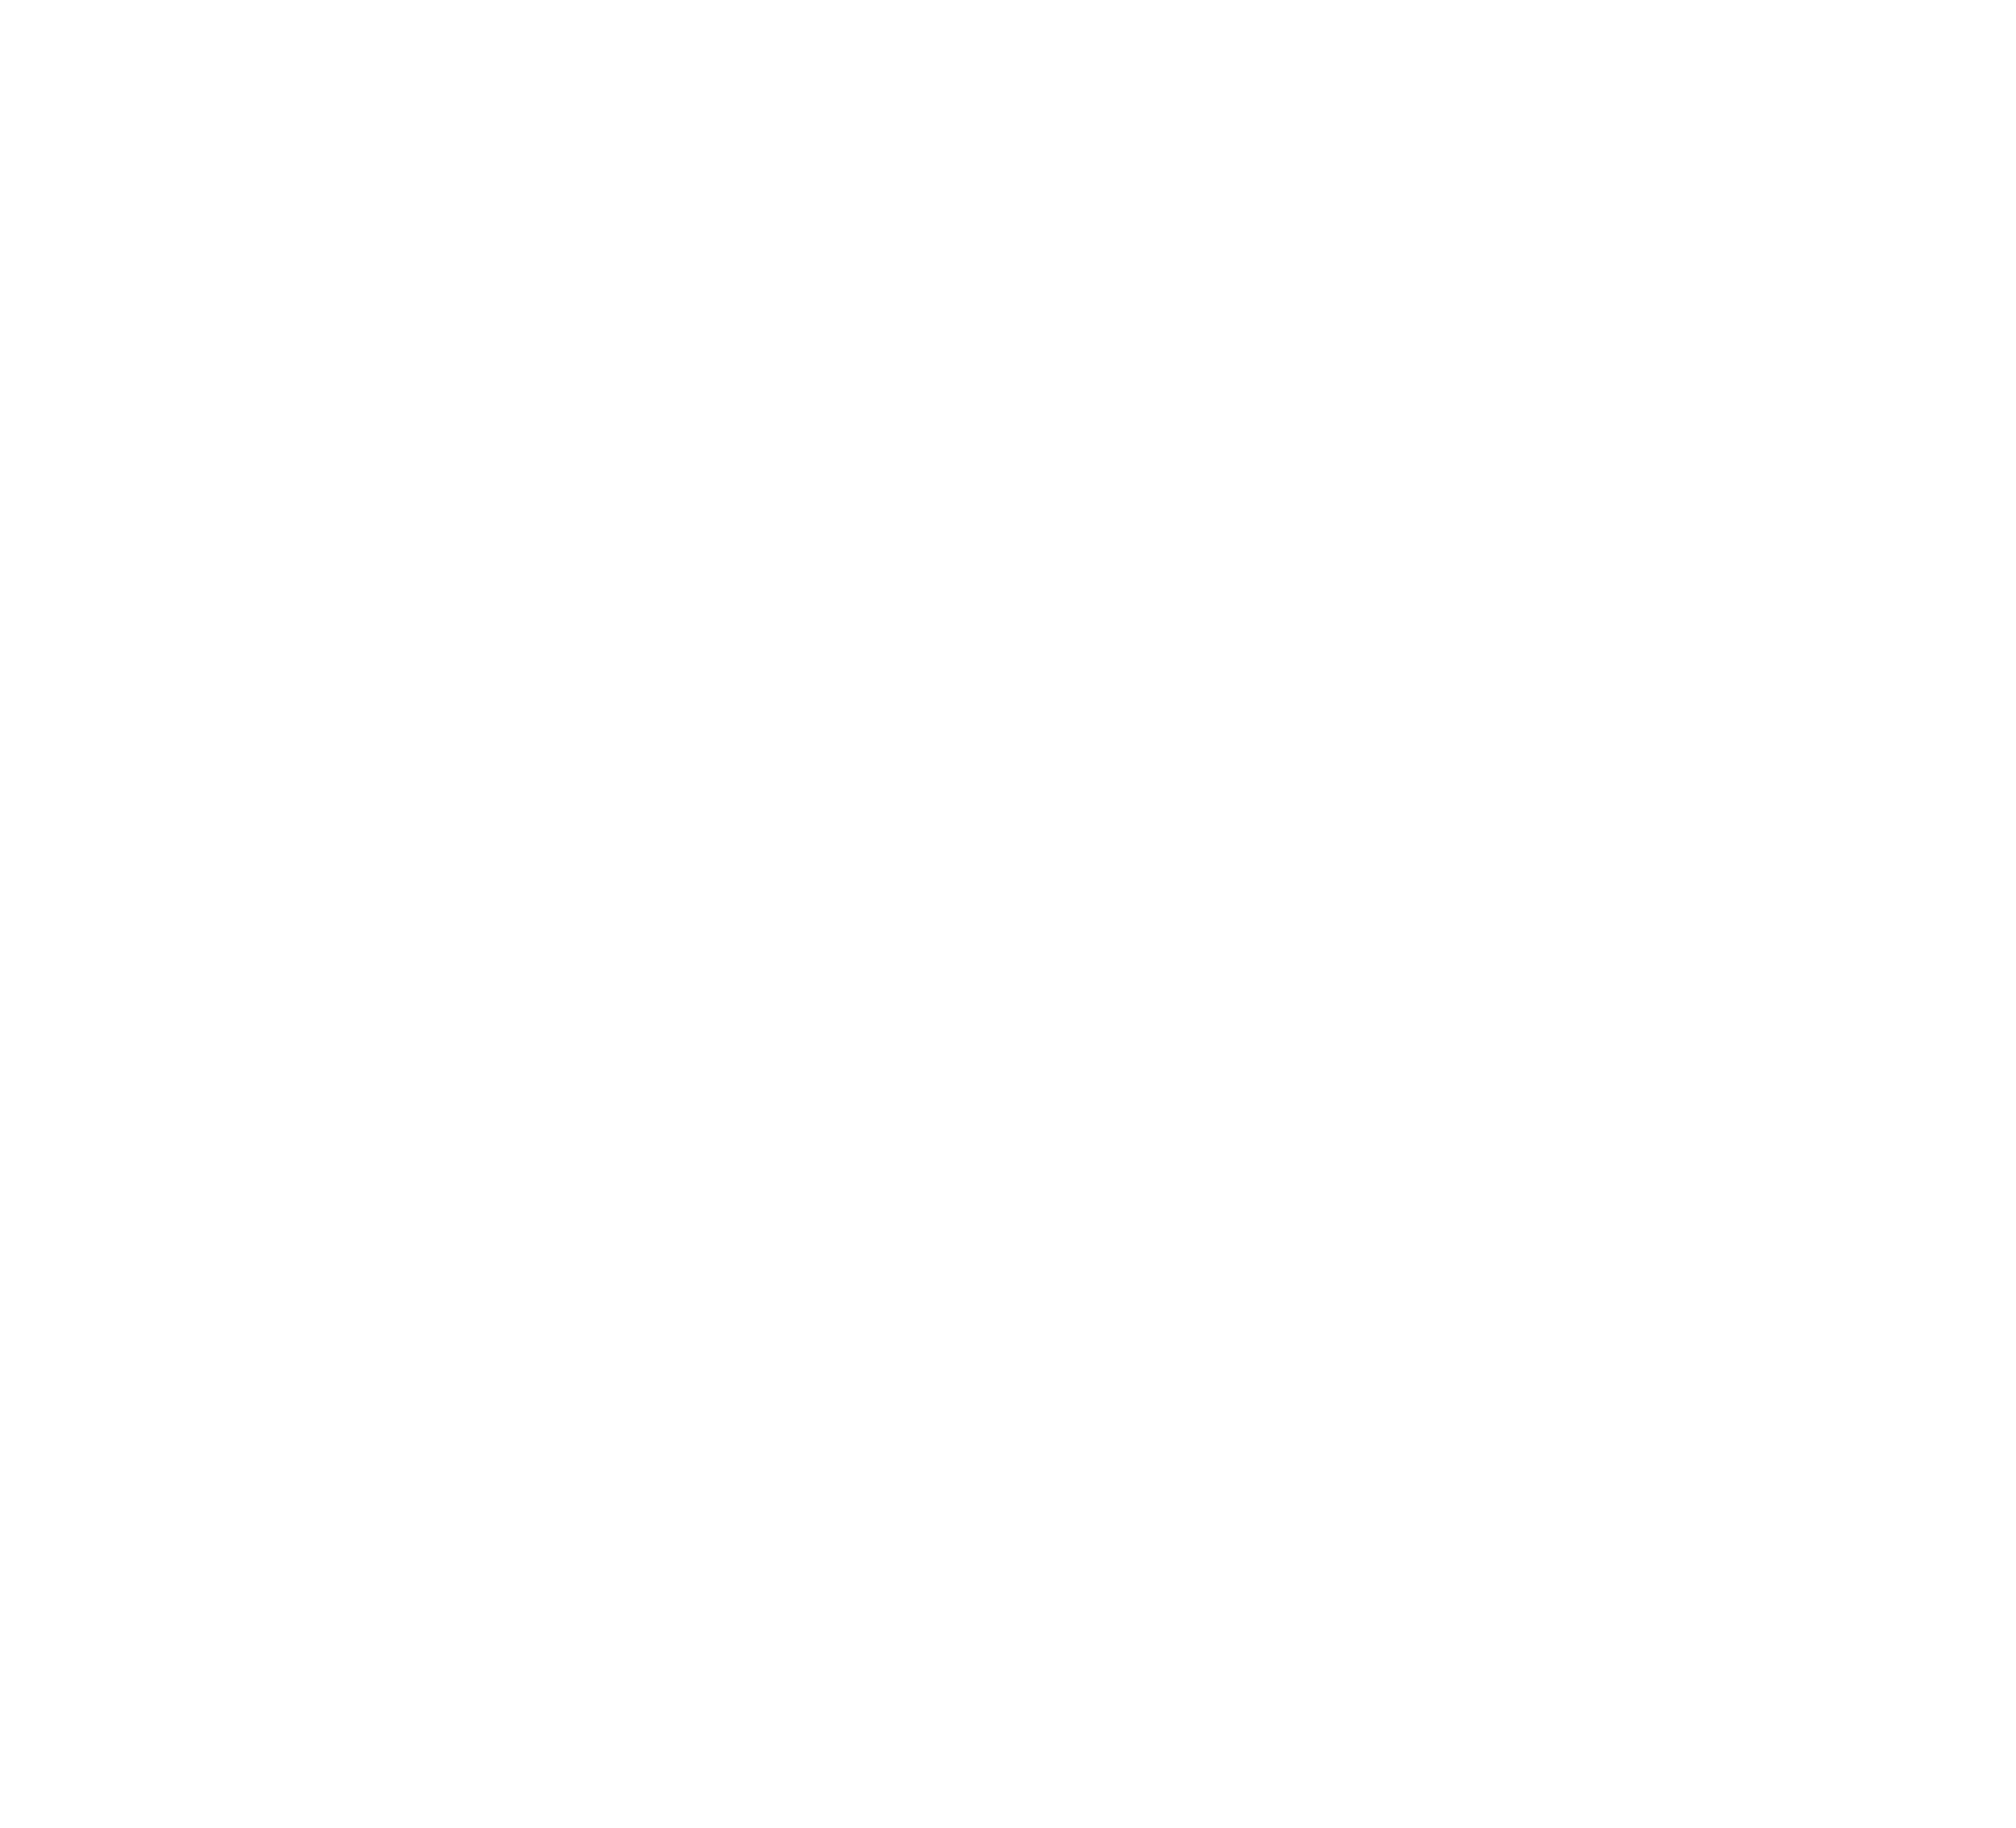 Dariusz Korganowski